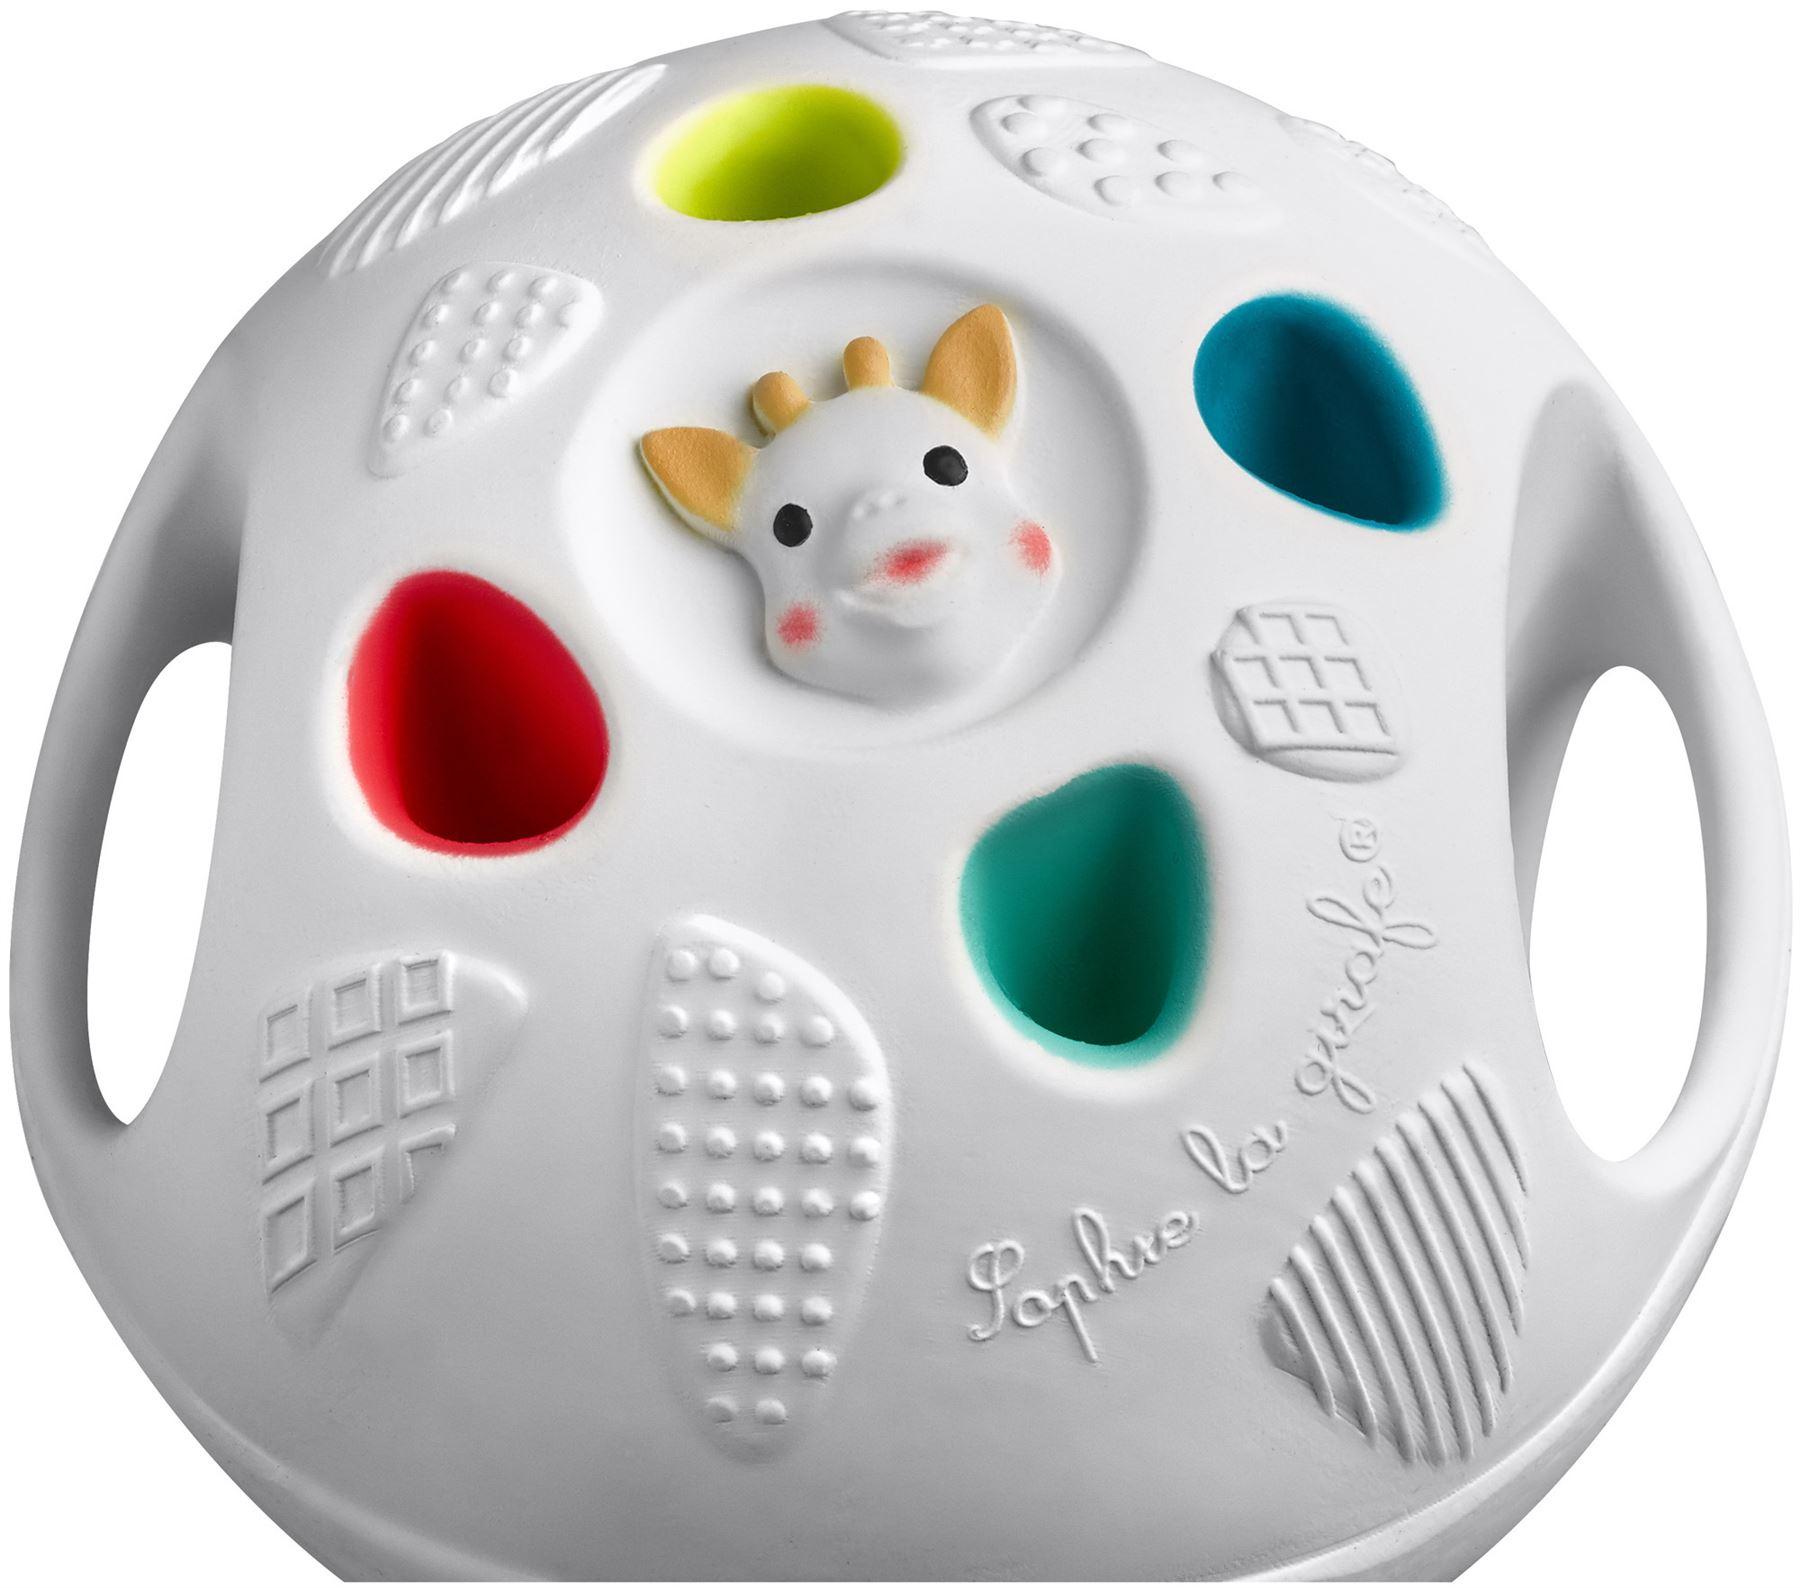 SOPHIE THE GIRAFFE SENSO BALL Baby Toy BNIP